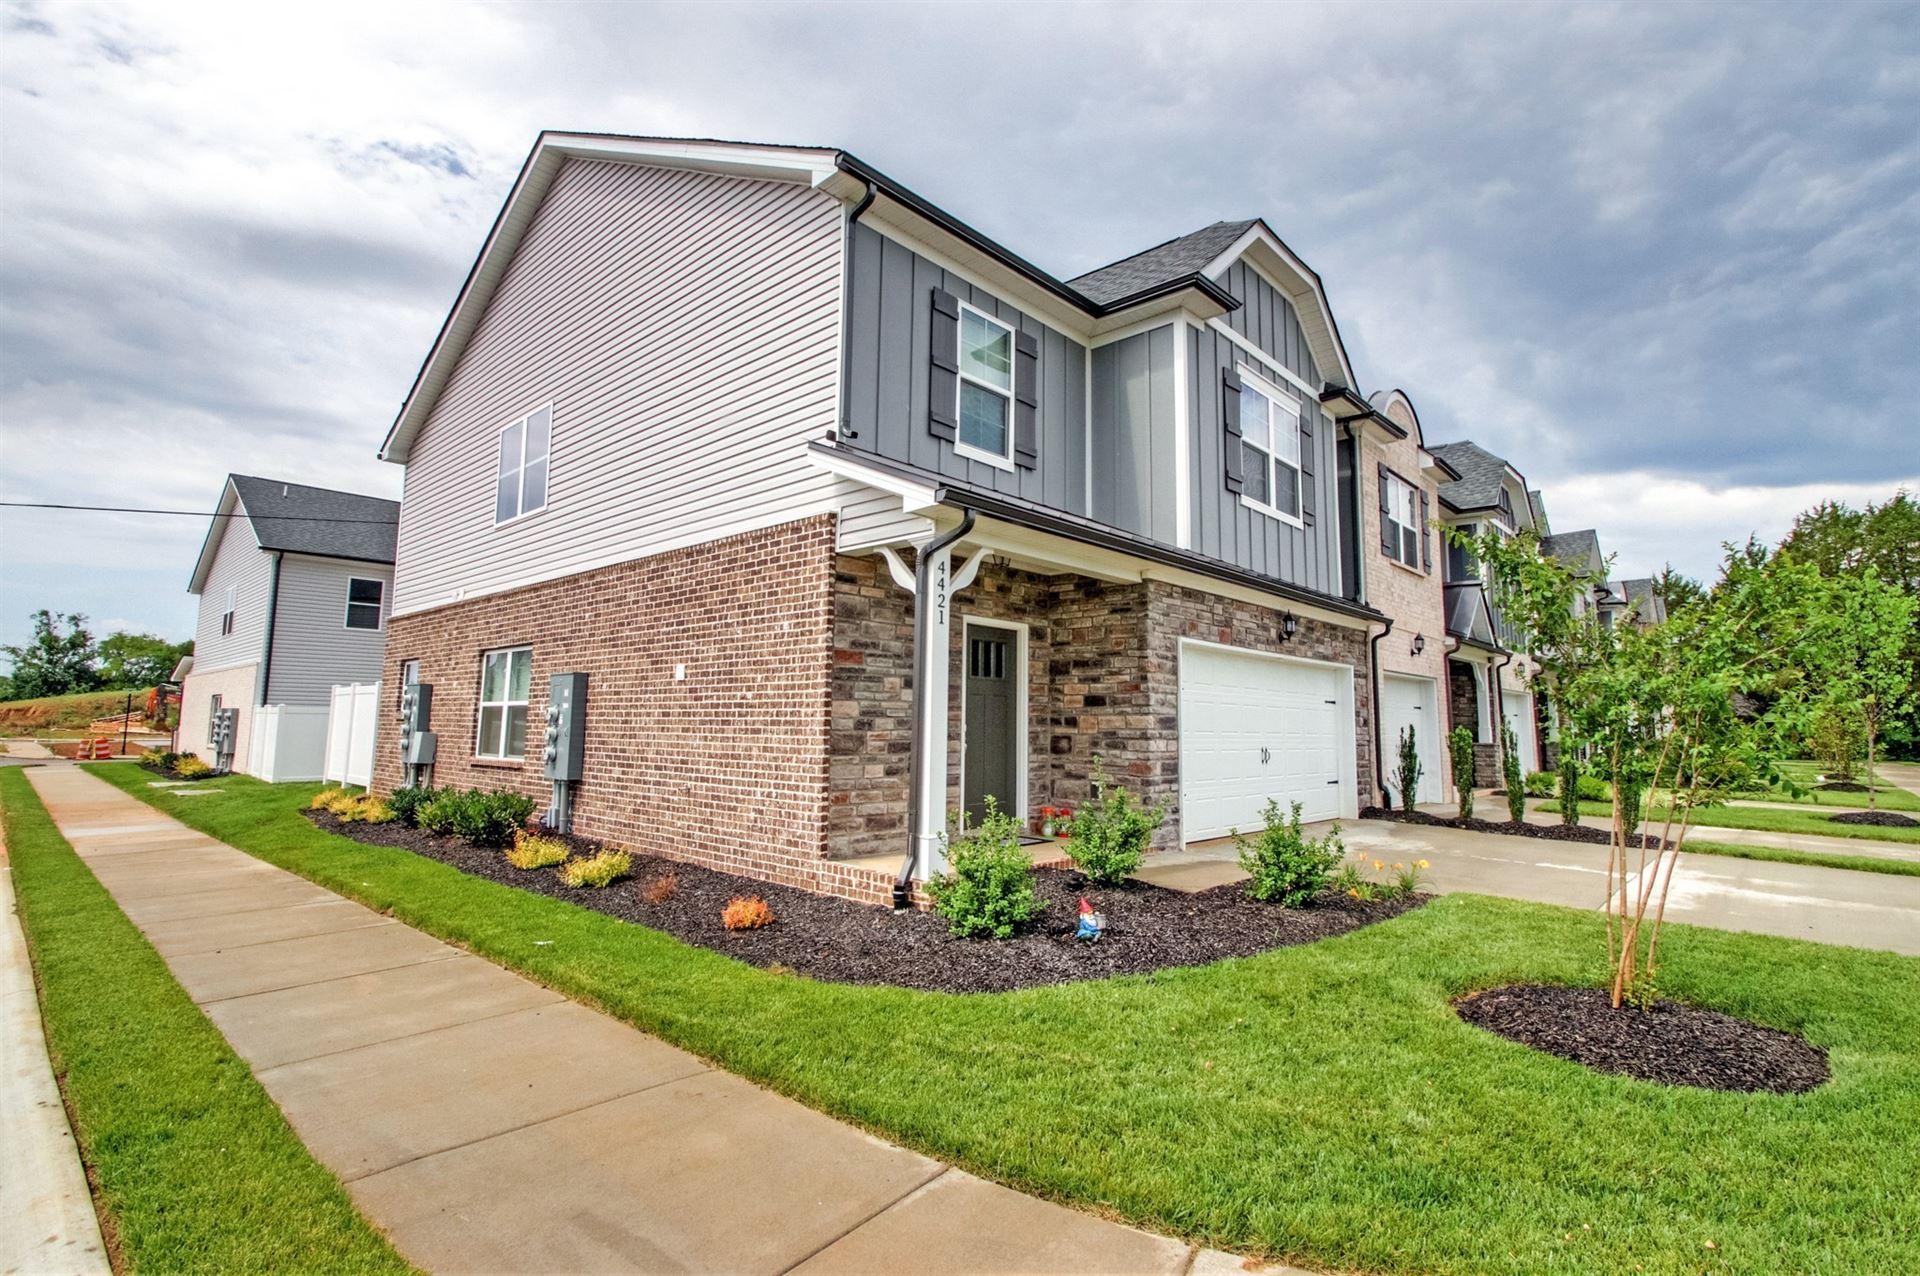 4405 Cross Keys Way, Murfreesboro, TN 37129 - MLS#: 2198411